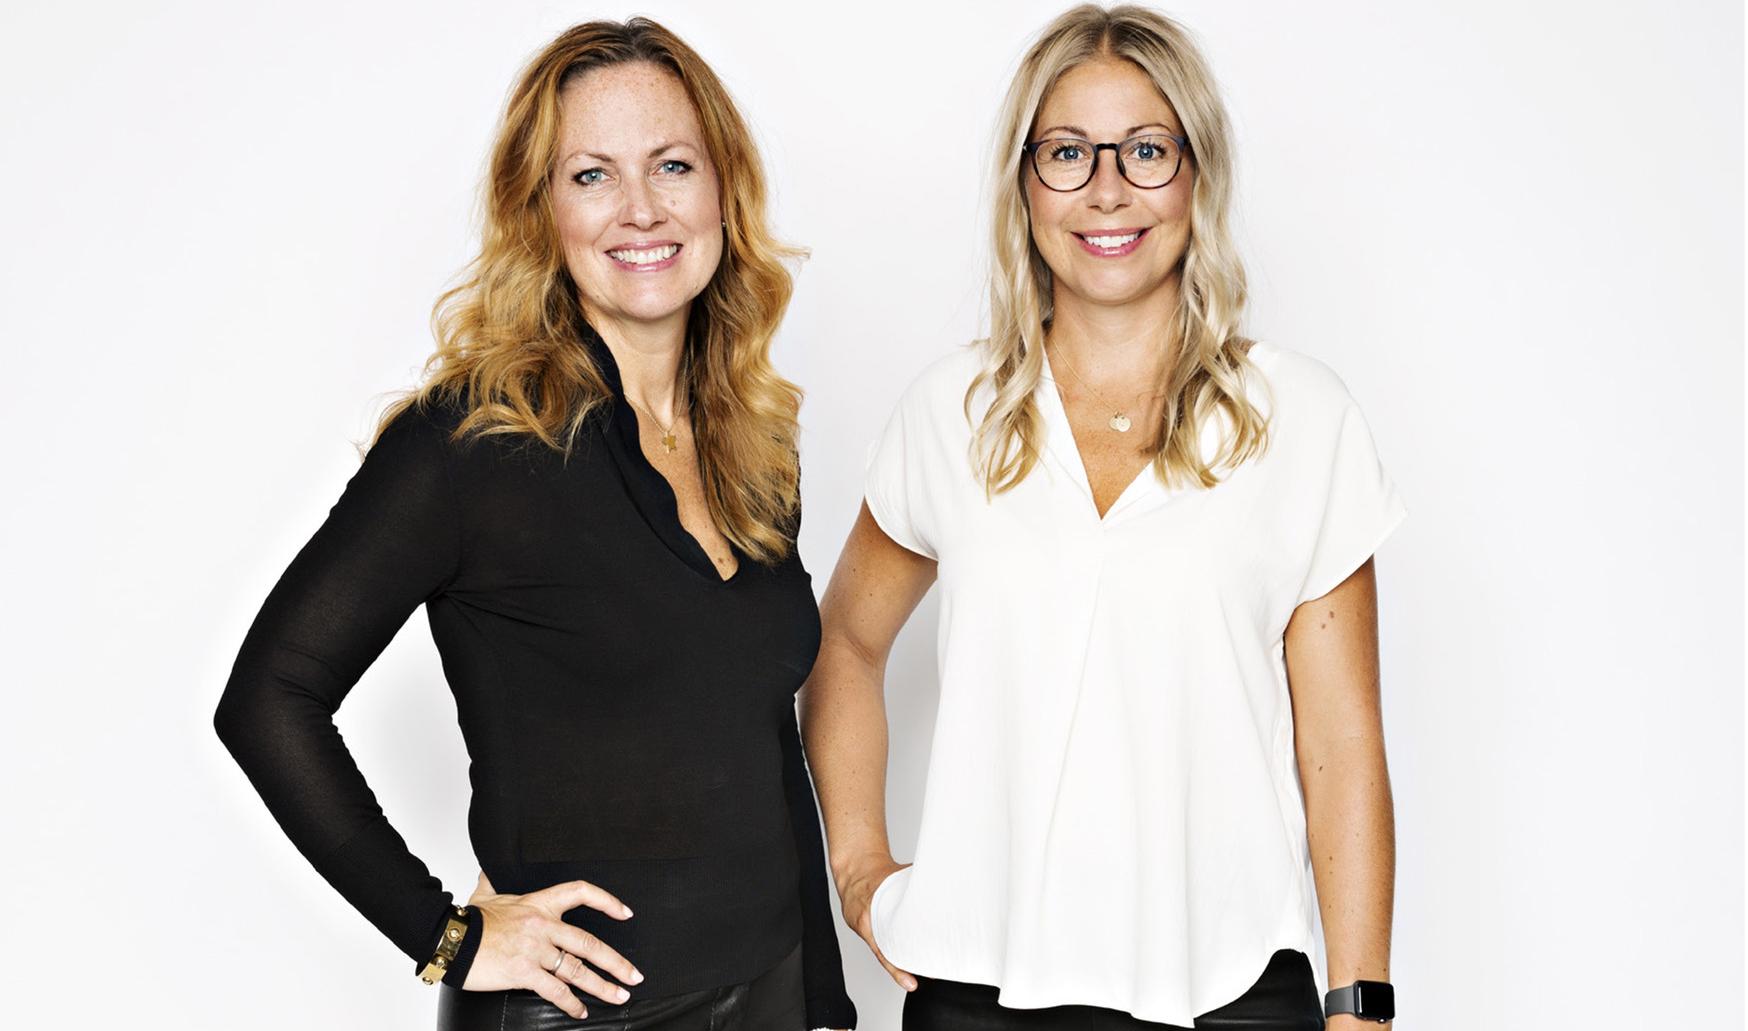 Rekryteringsproffsen Ann-Christine Stafwerfeldt och Josefin Malmer.